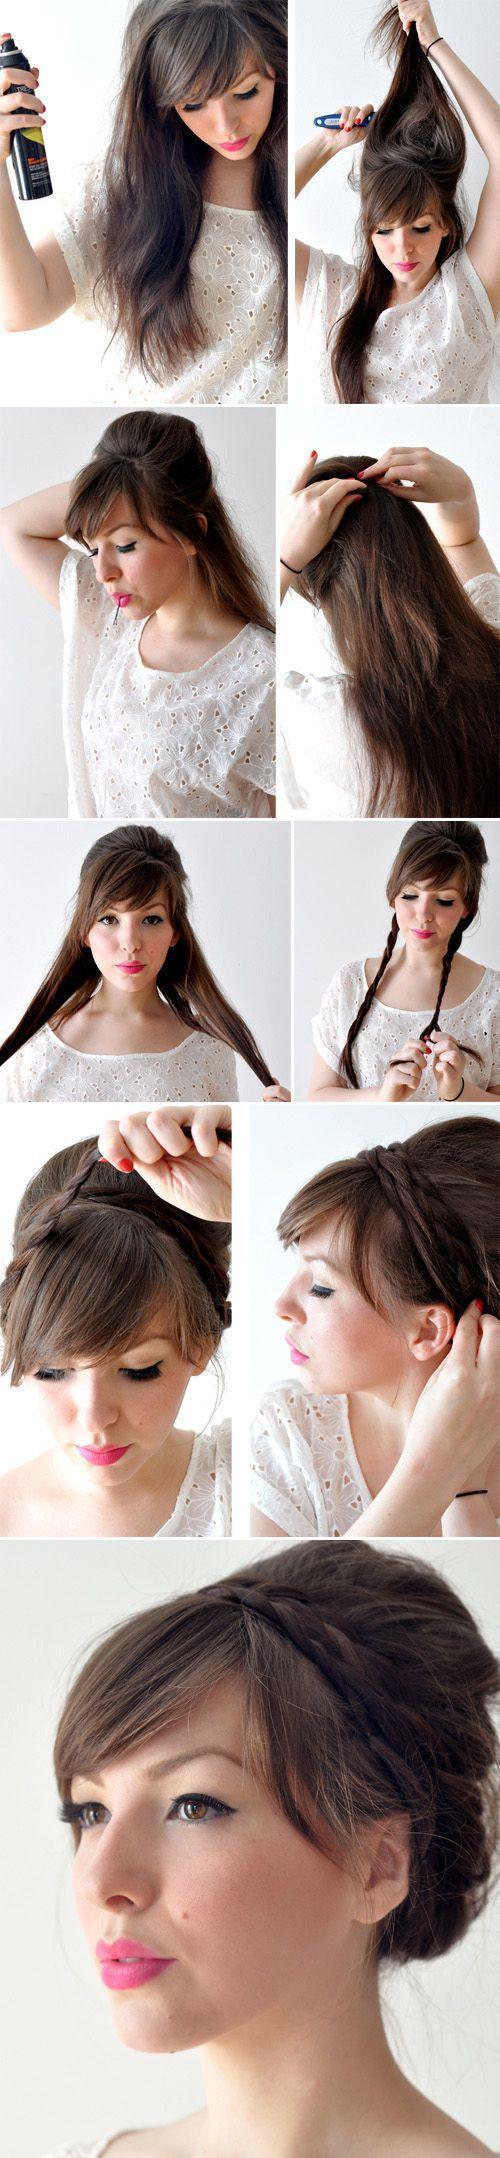 hair-styles-3